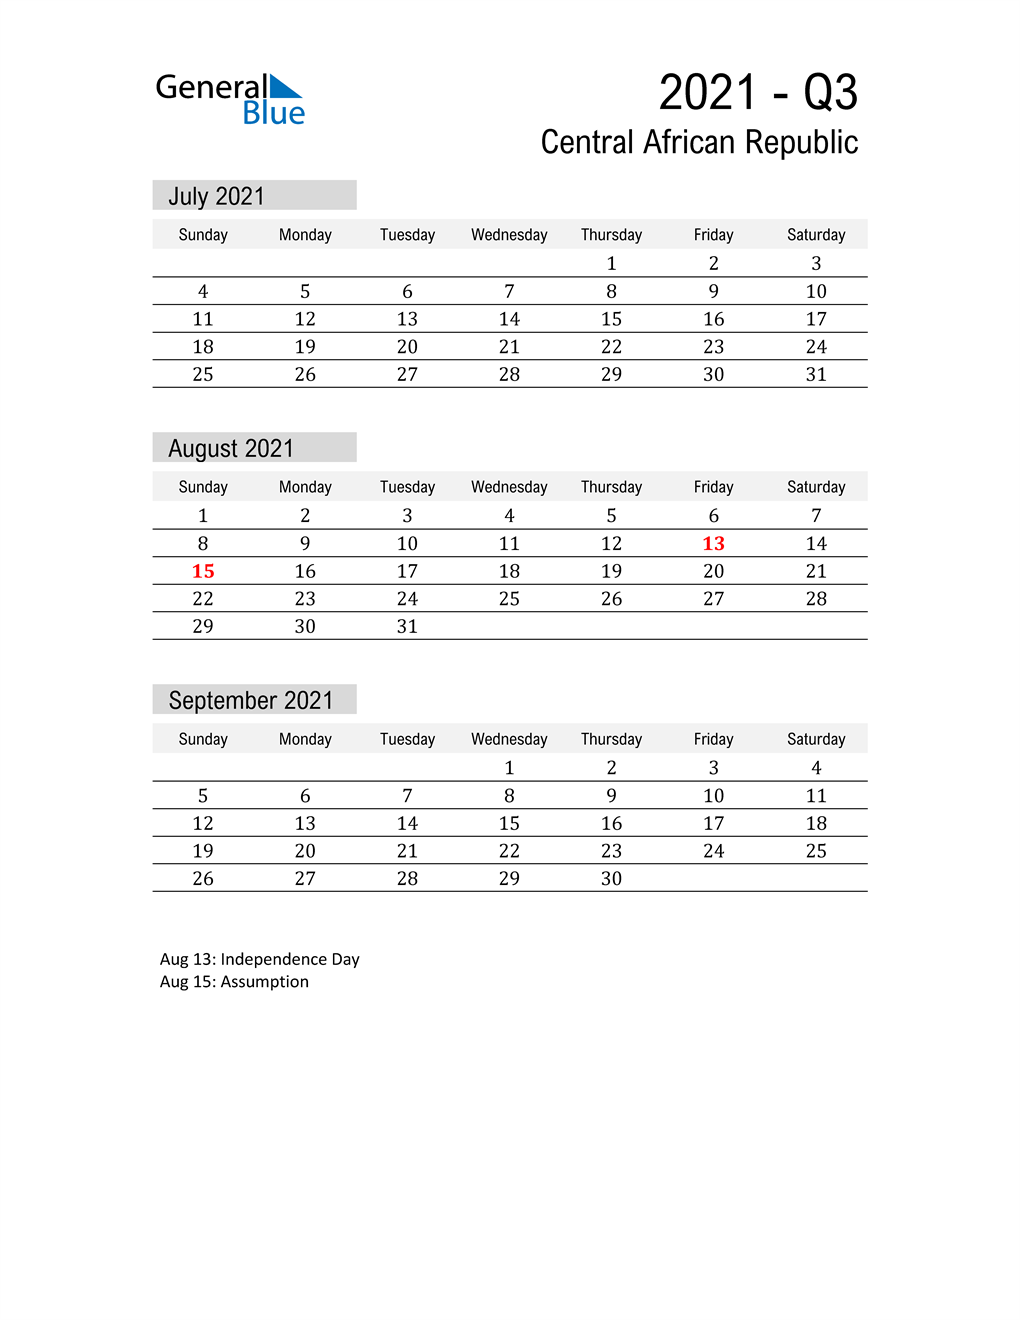 Central African Republic Quarter 3 2021 Calendar